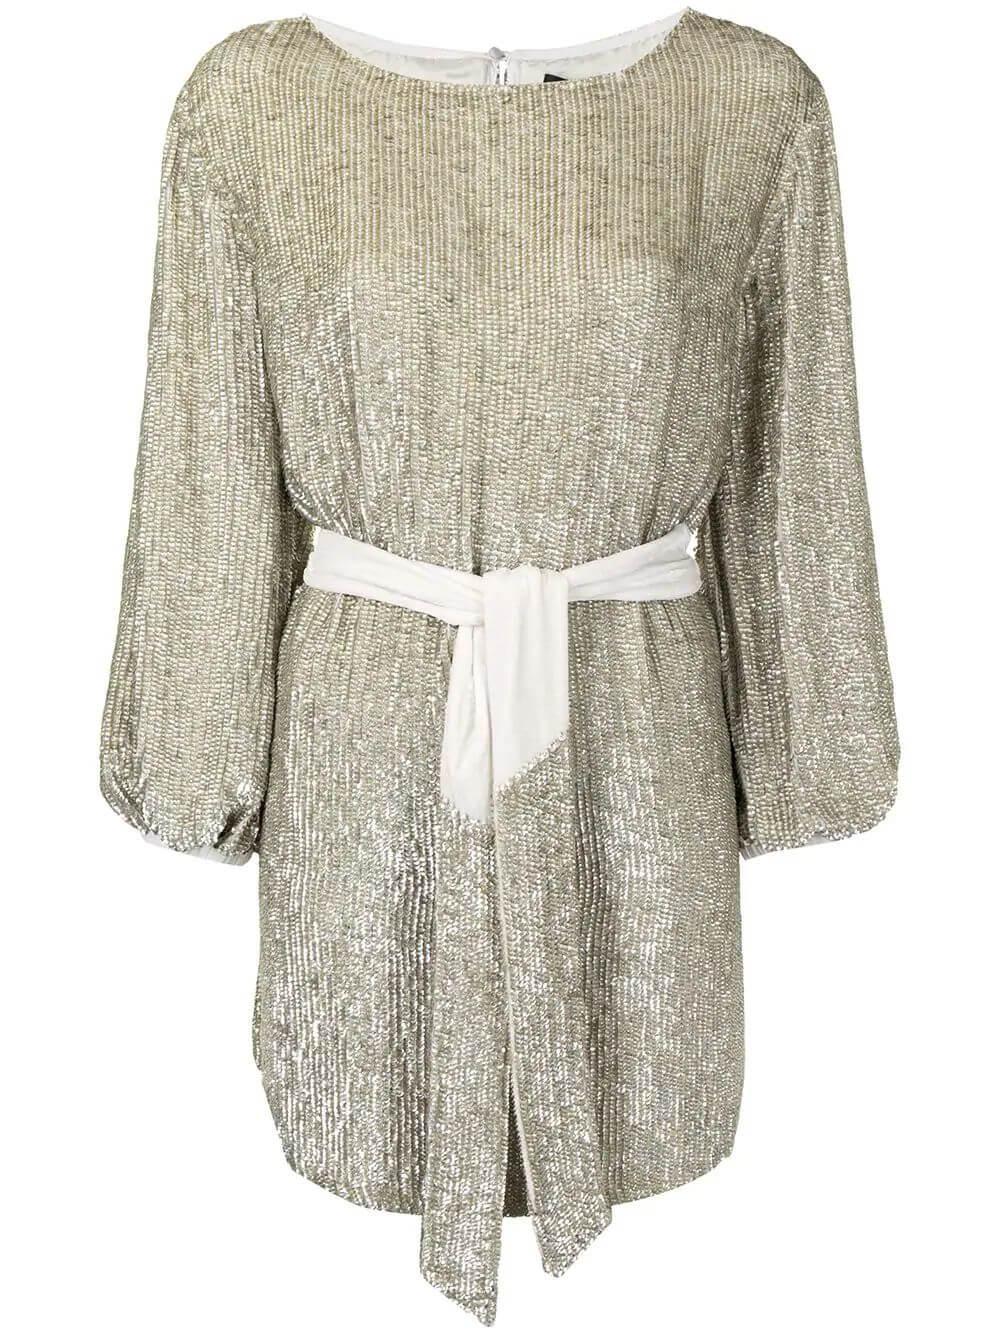 Grace Belted Sequin Dress Item # SS20-2721-PF20